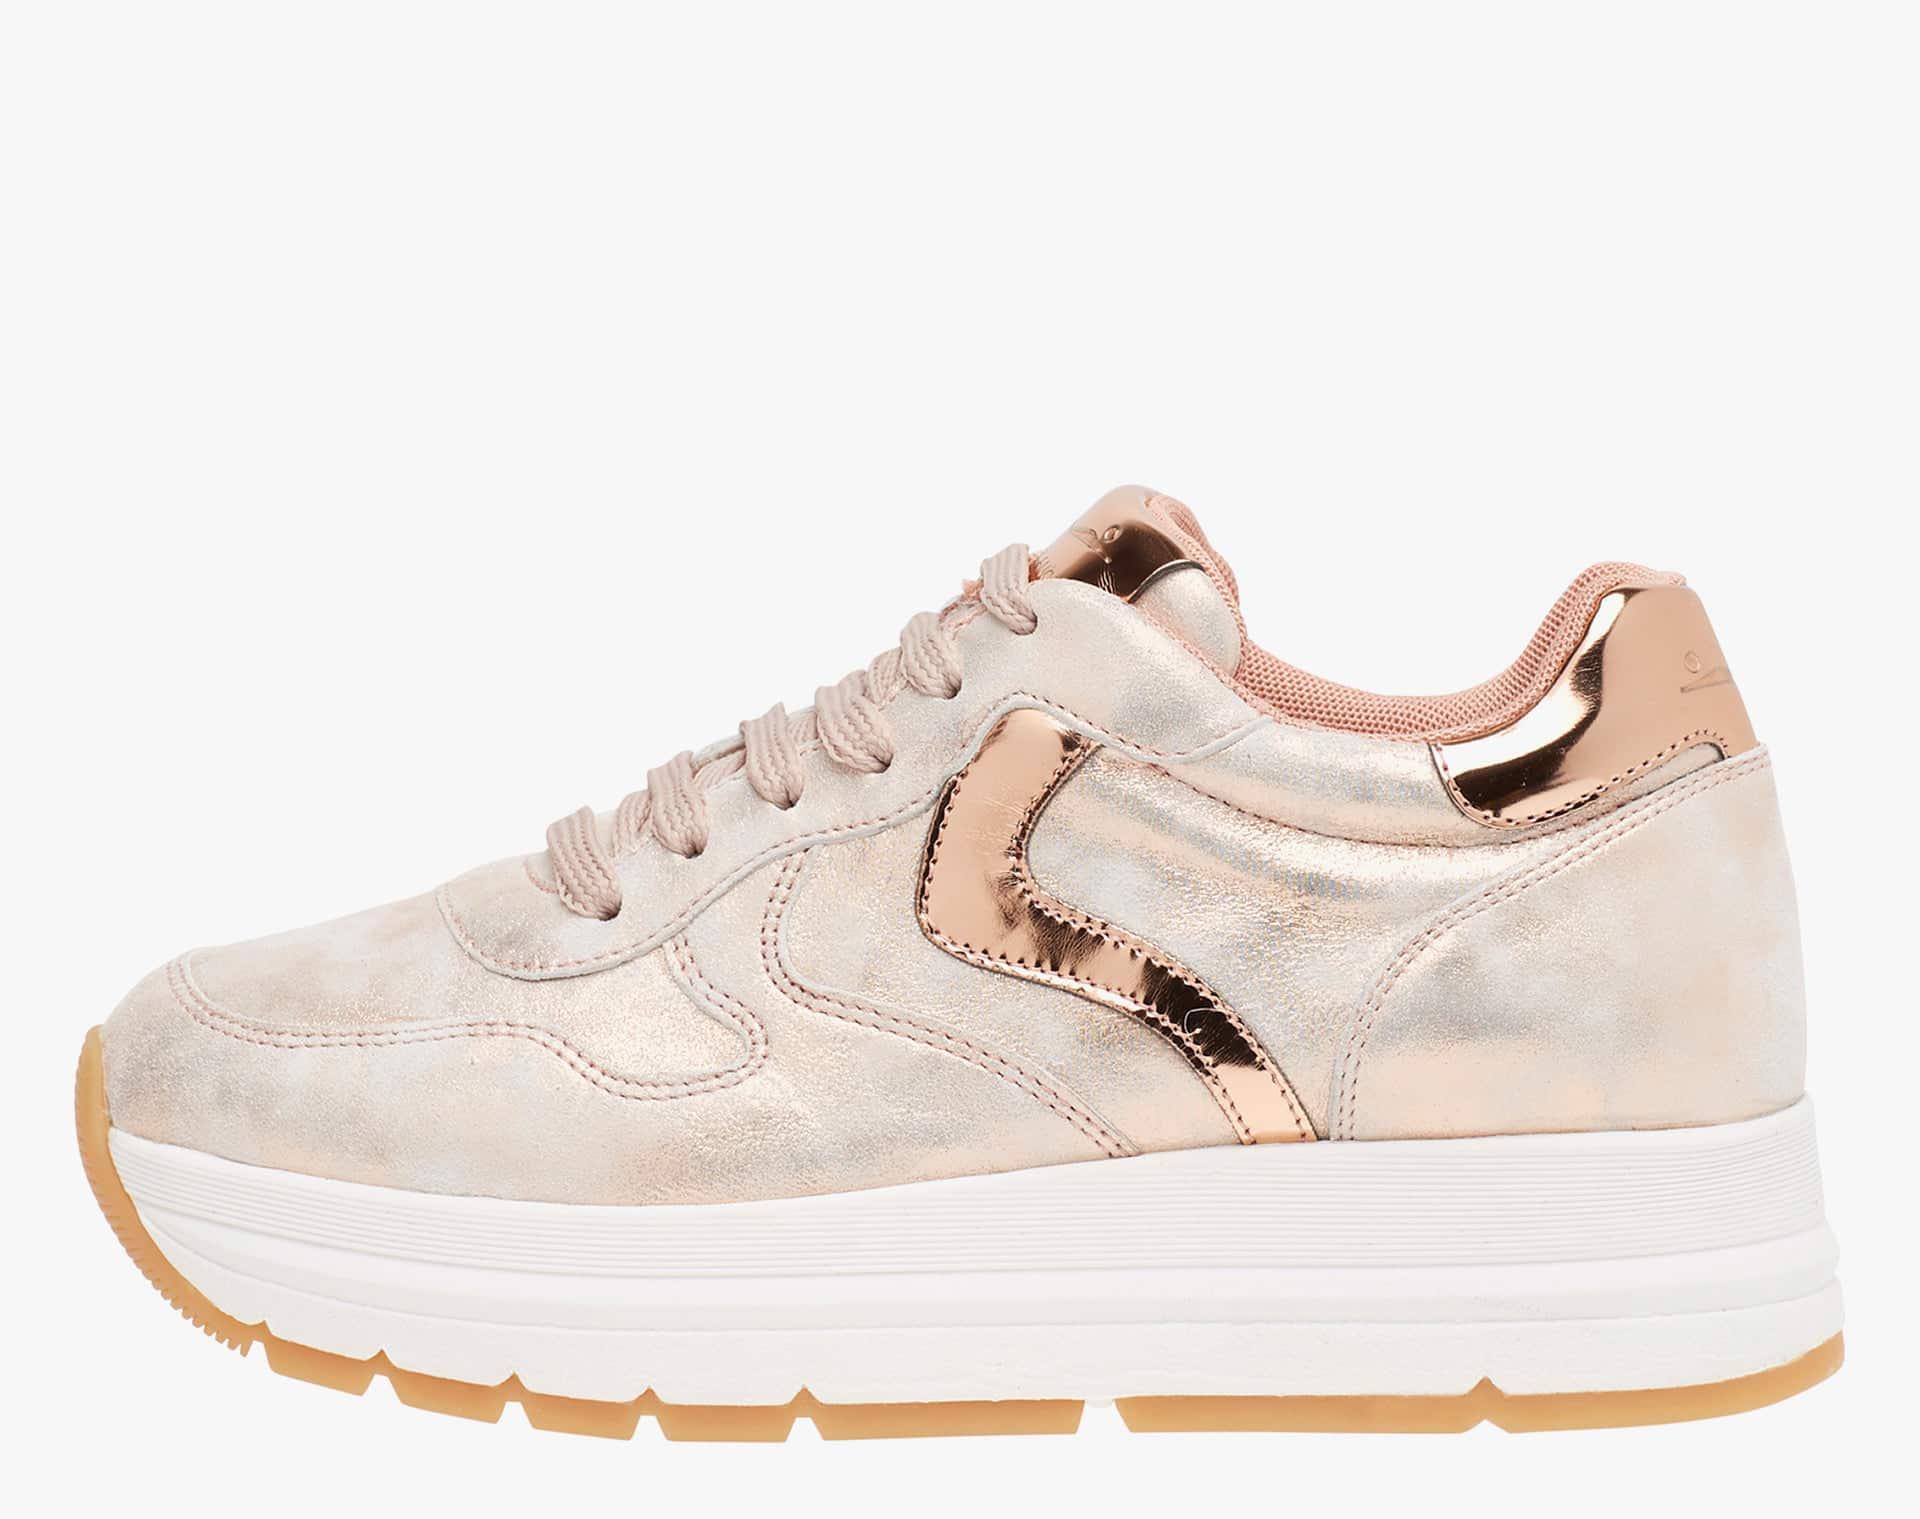 MARAN - Pink laminated calfskin sneakers - Pink